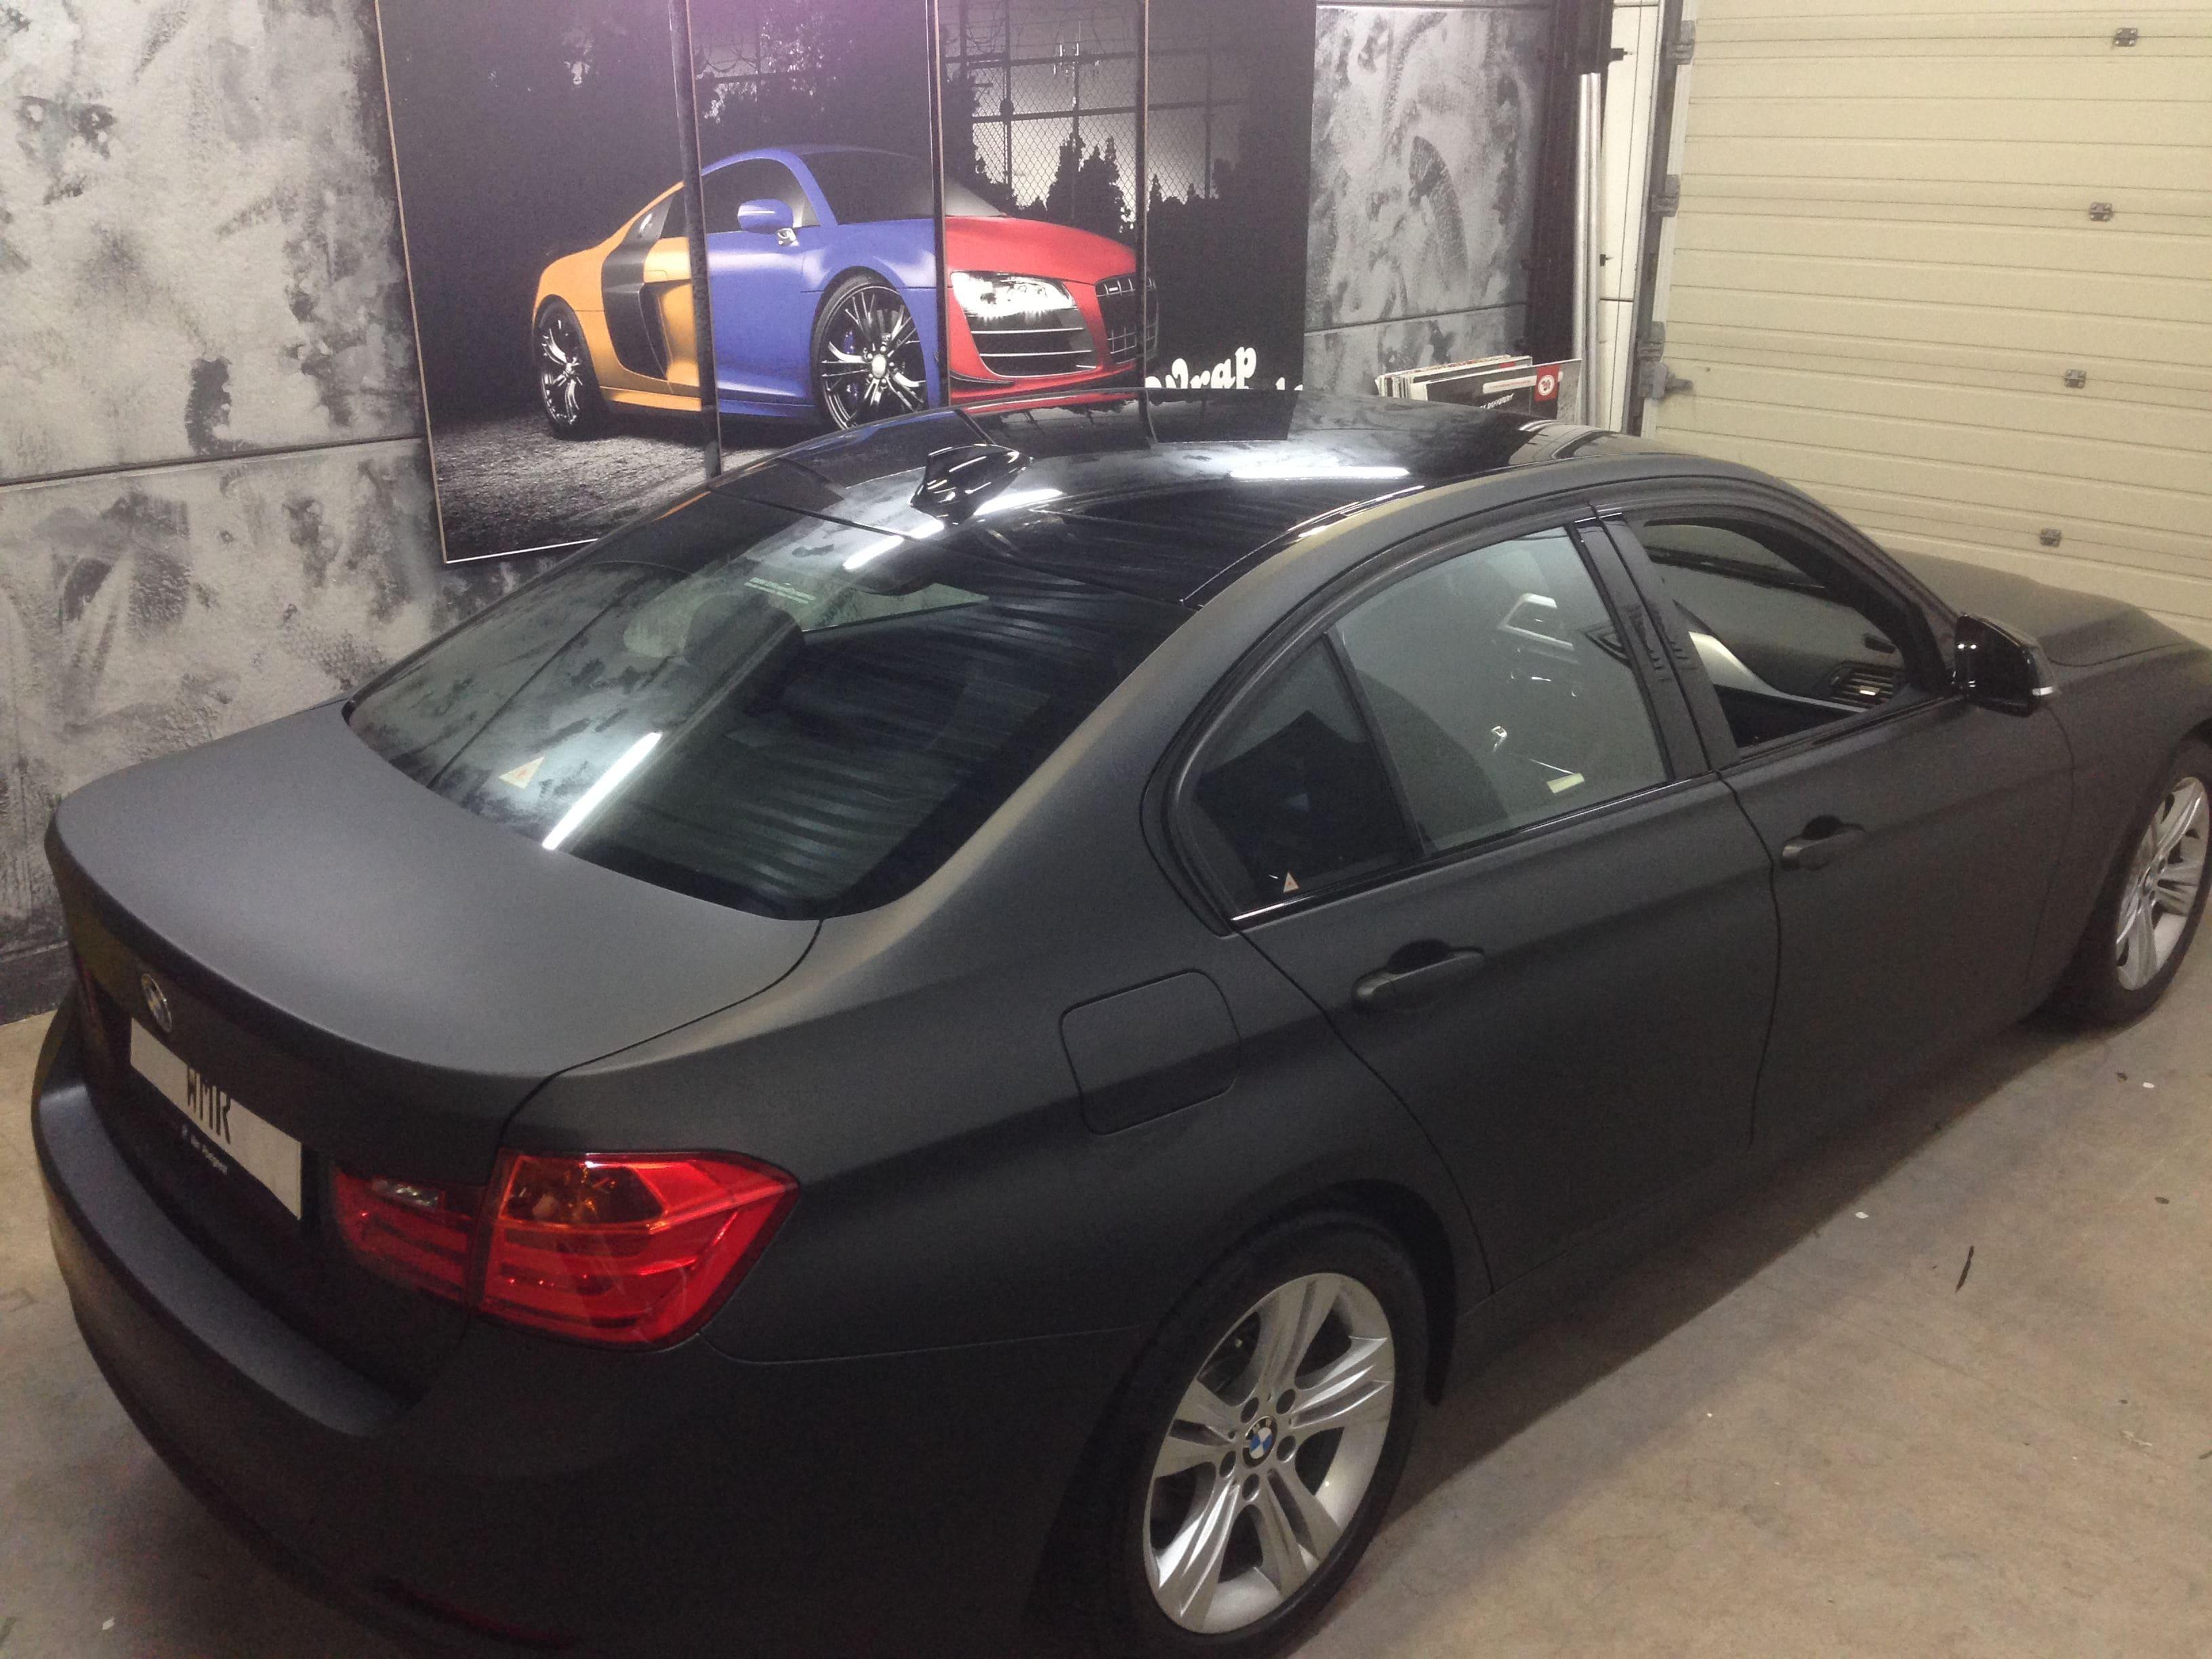 BMW E92 3 Serie met Mat Zwarte Wrap, Carwrapping door Wrapmyride.nu Foto-nr:5413, ©2020